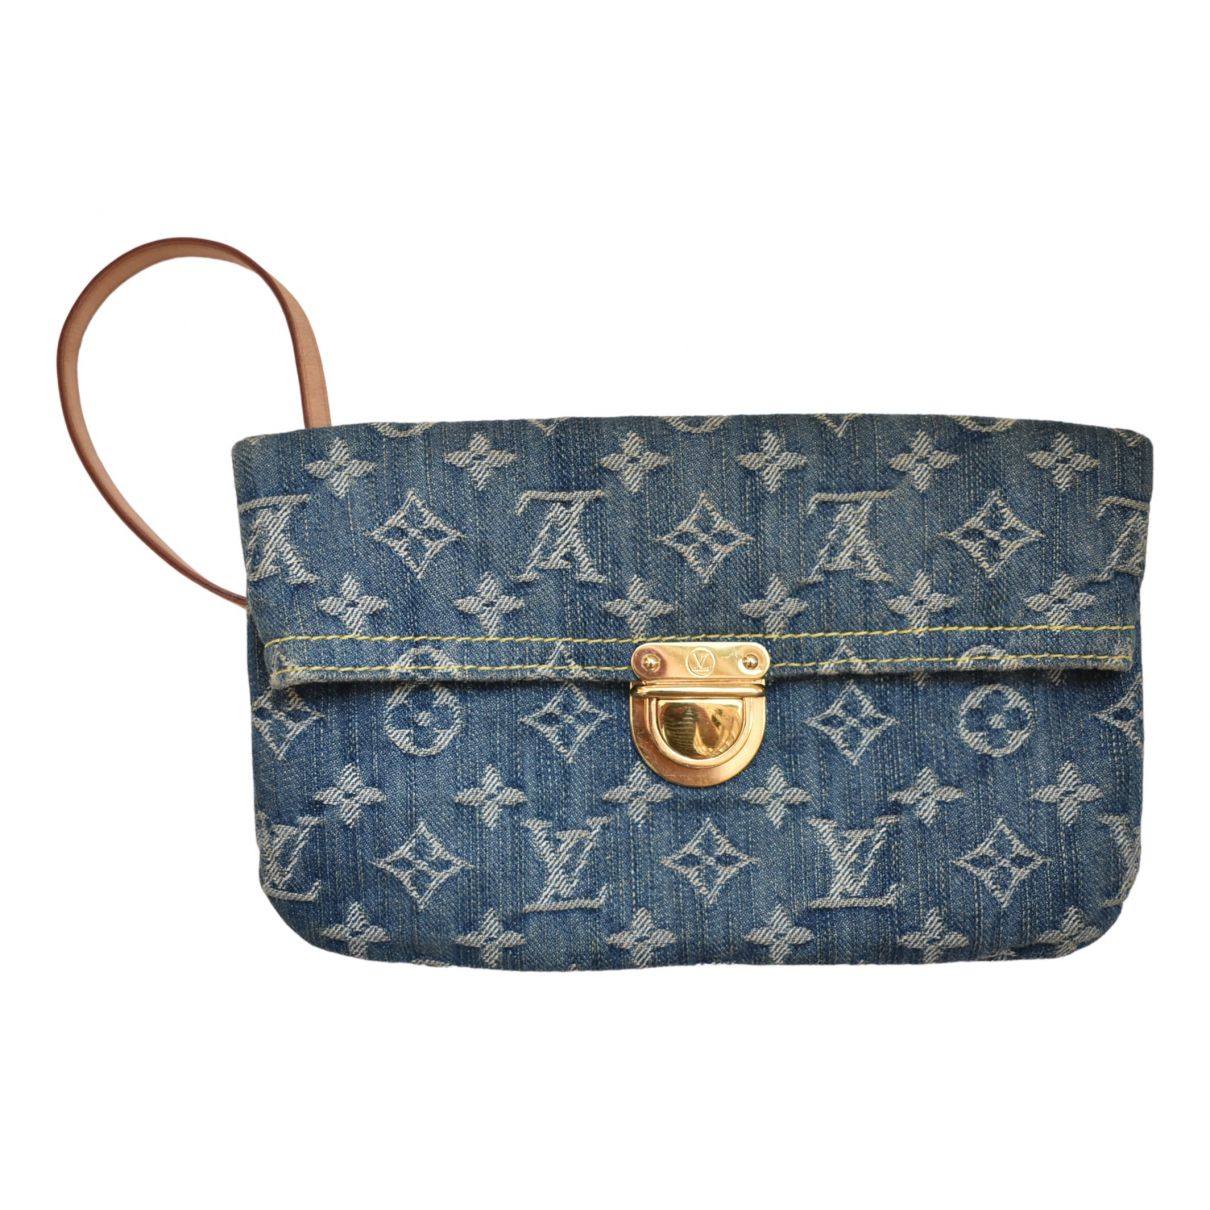 Louis Vuitton Plat Clutch in  Blau Denim - Jeans